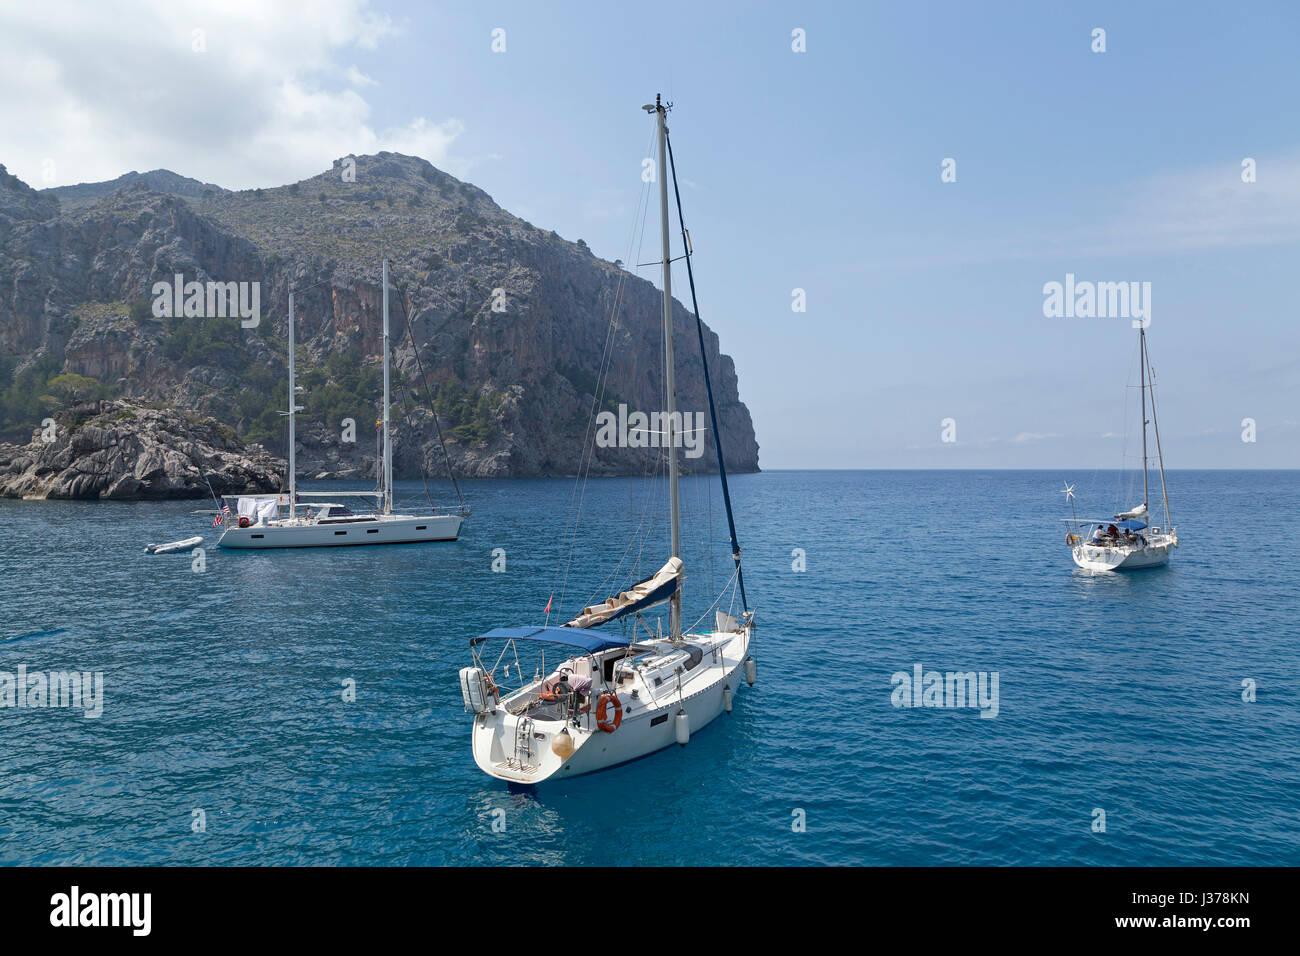 sailing boats in the bay of Sa Calobra, Serra de Tramuntana, Mallorca, Spain - Stock Image